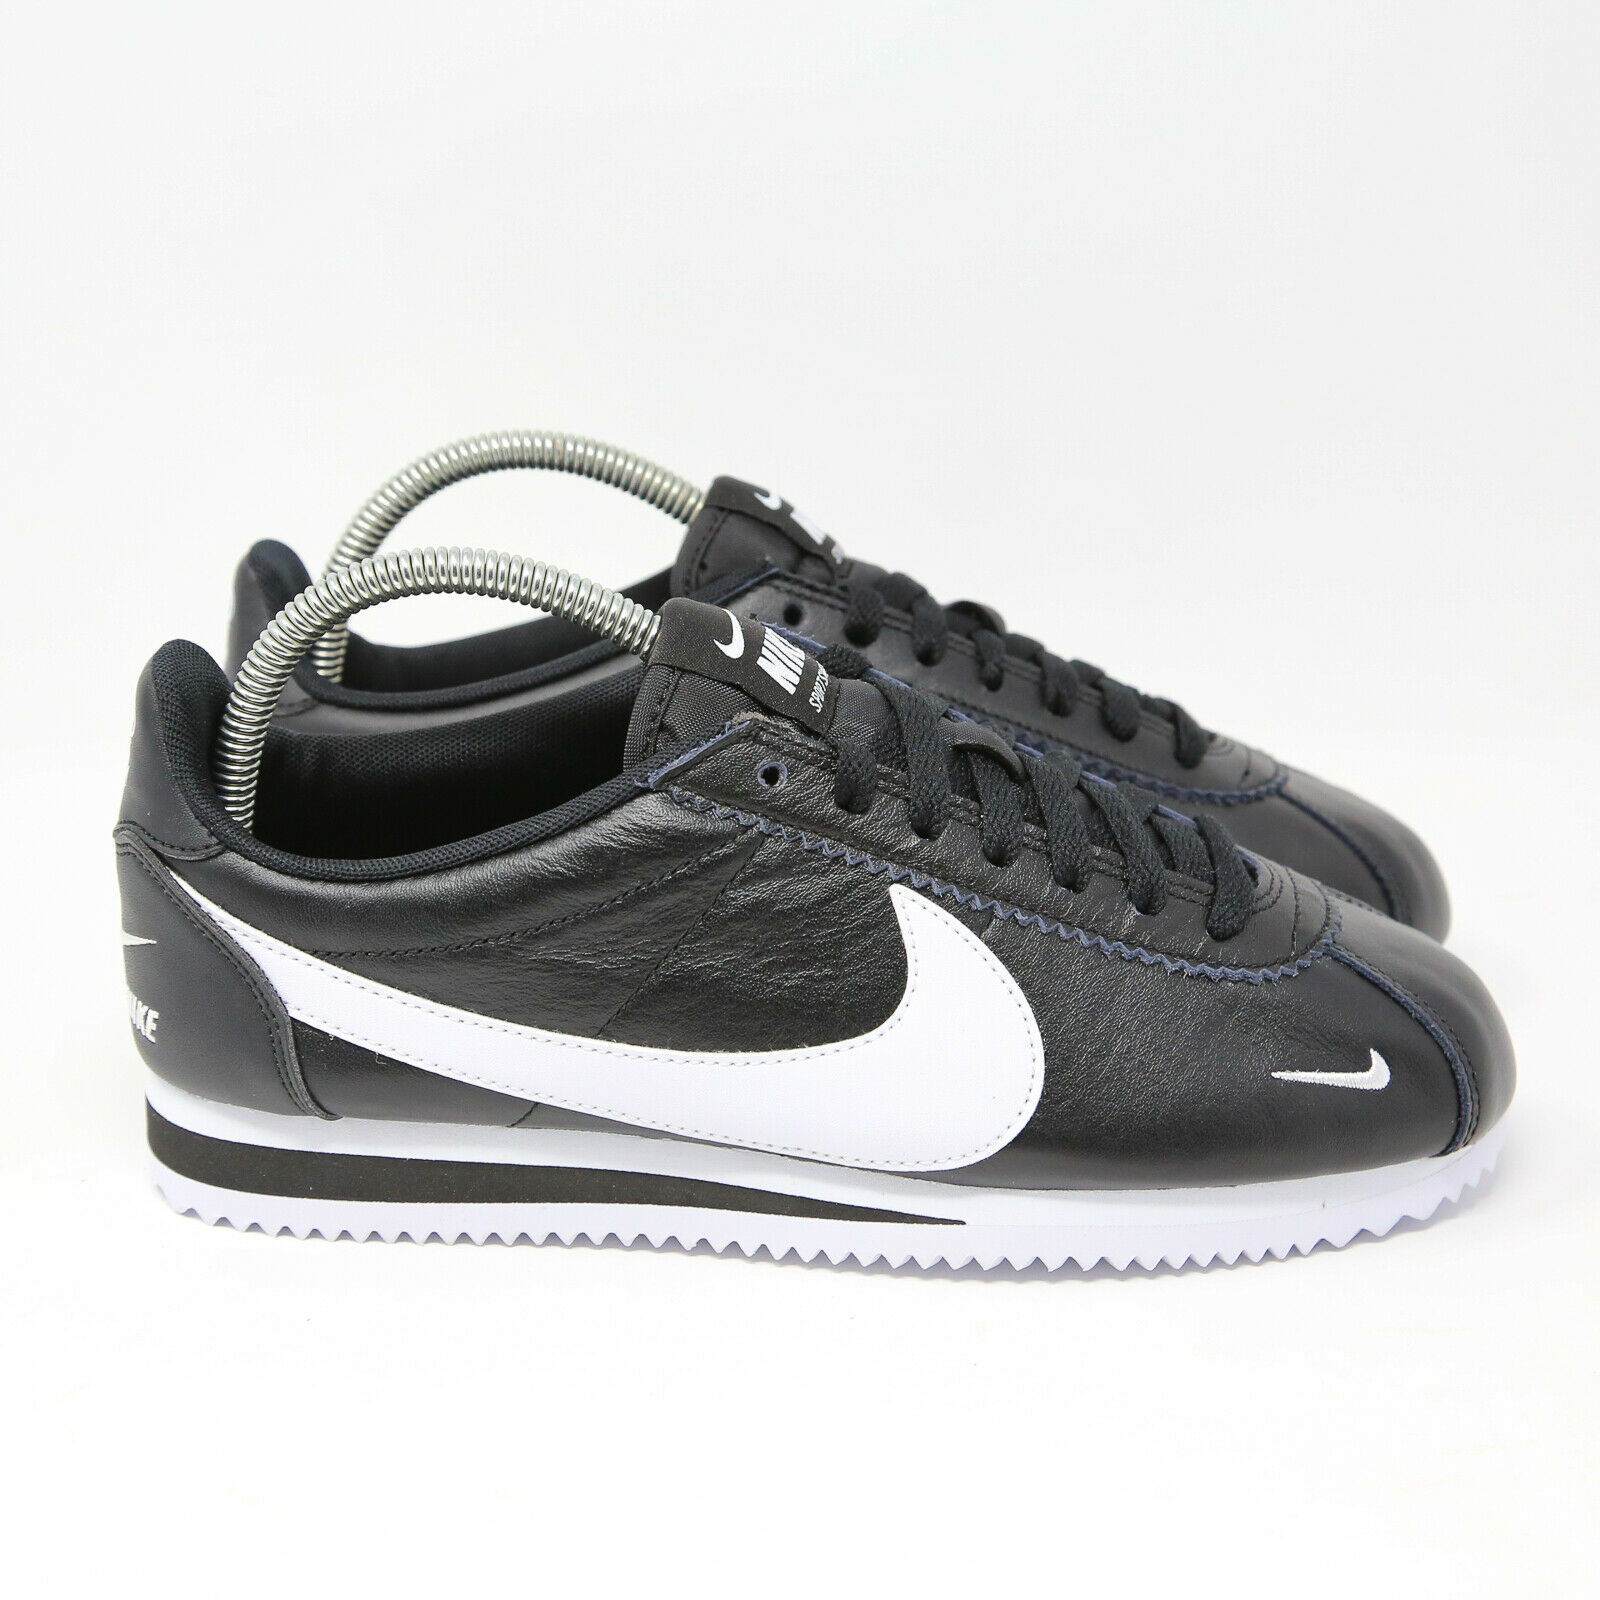 Nike Classic Cortez Premium Running Sneaker Black White sz 8 807480-004 gump